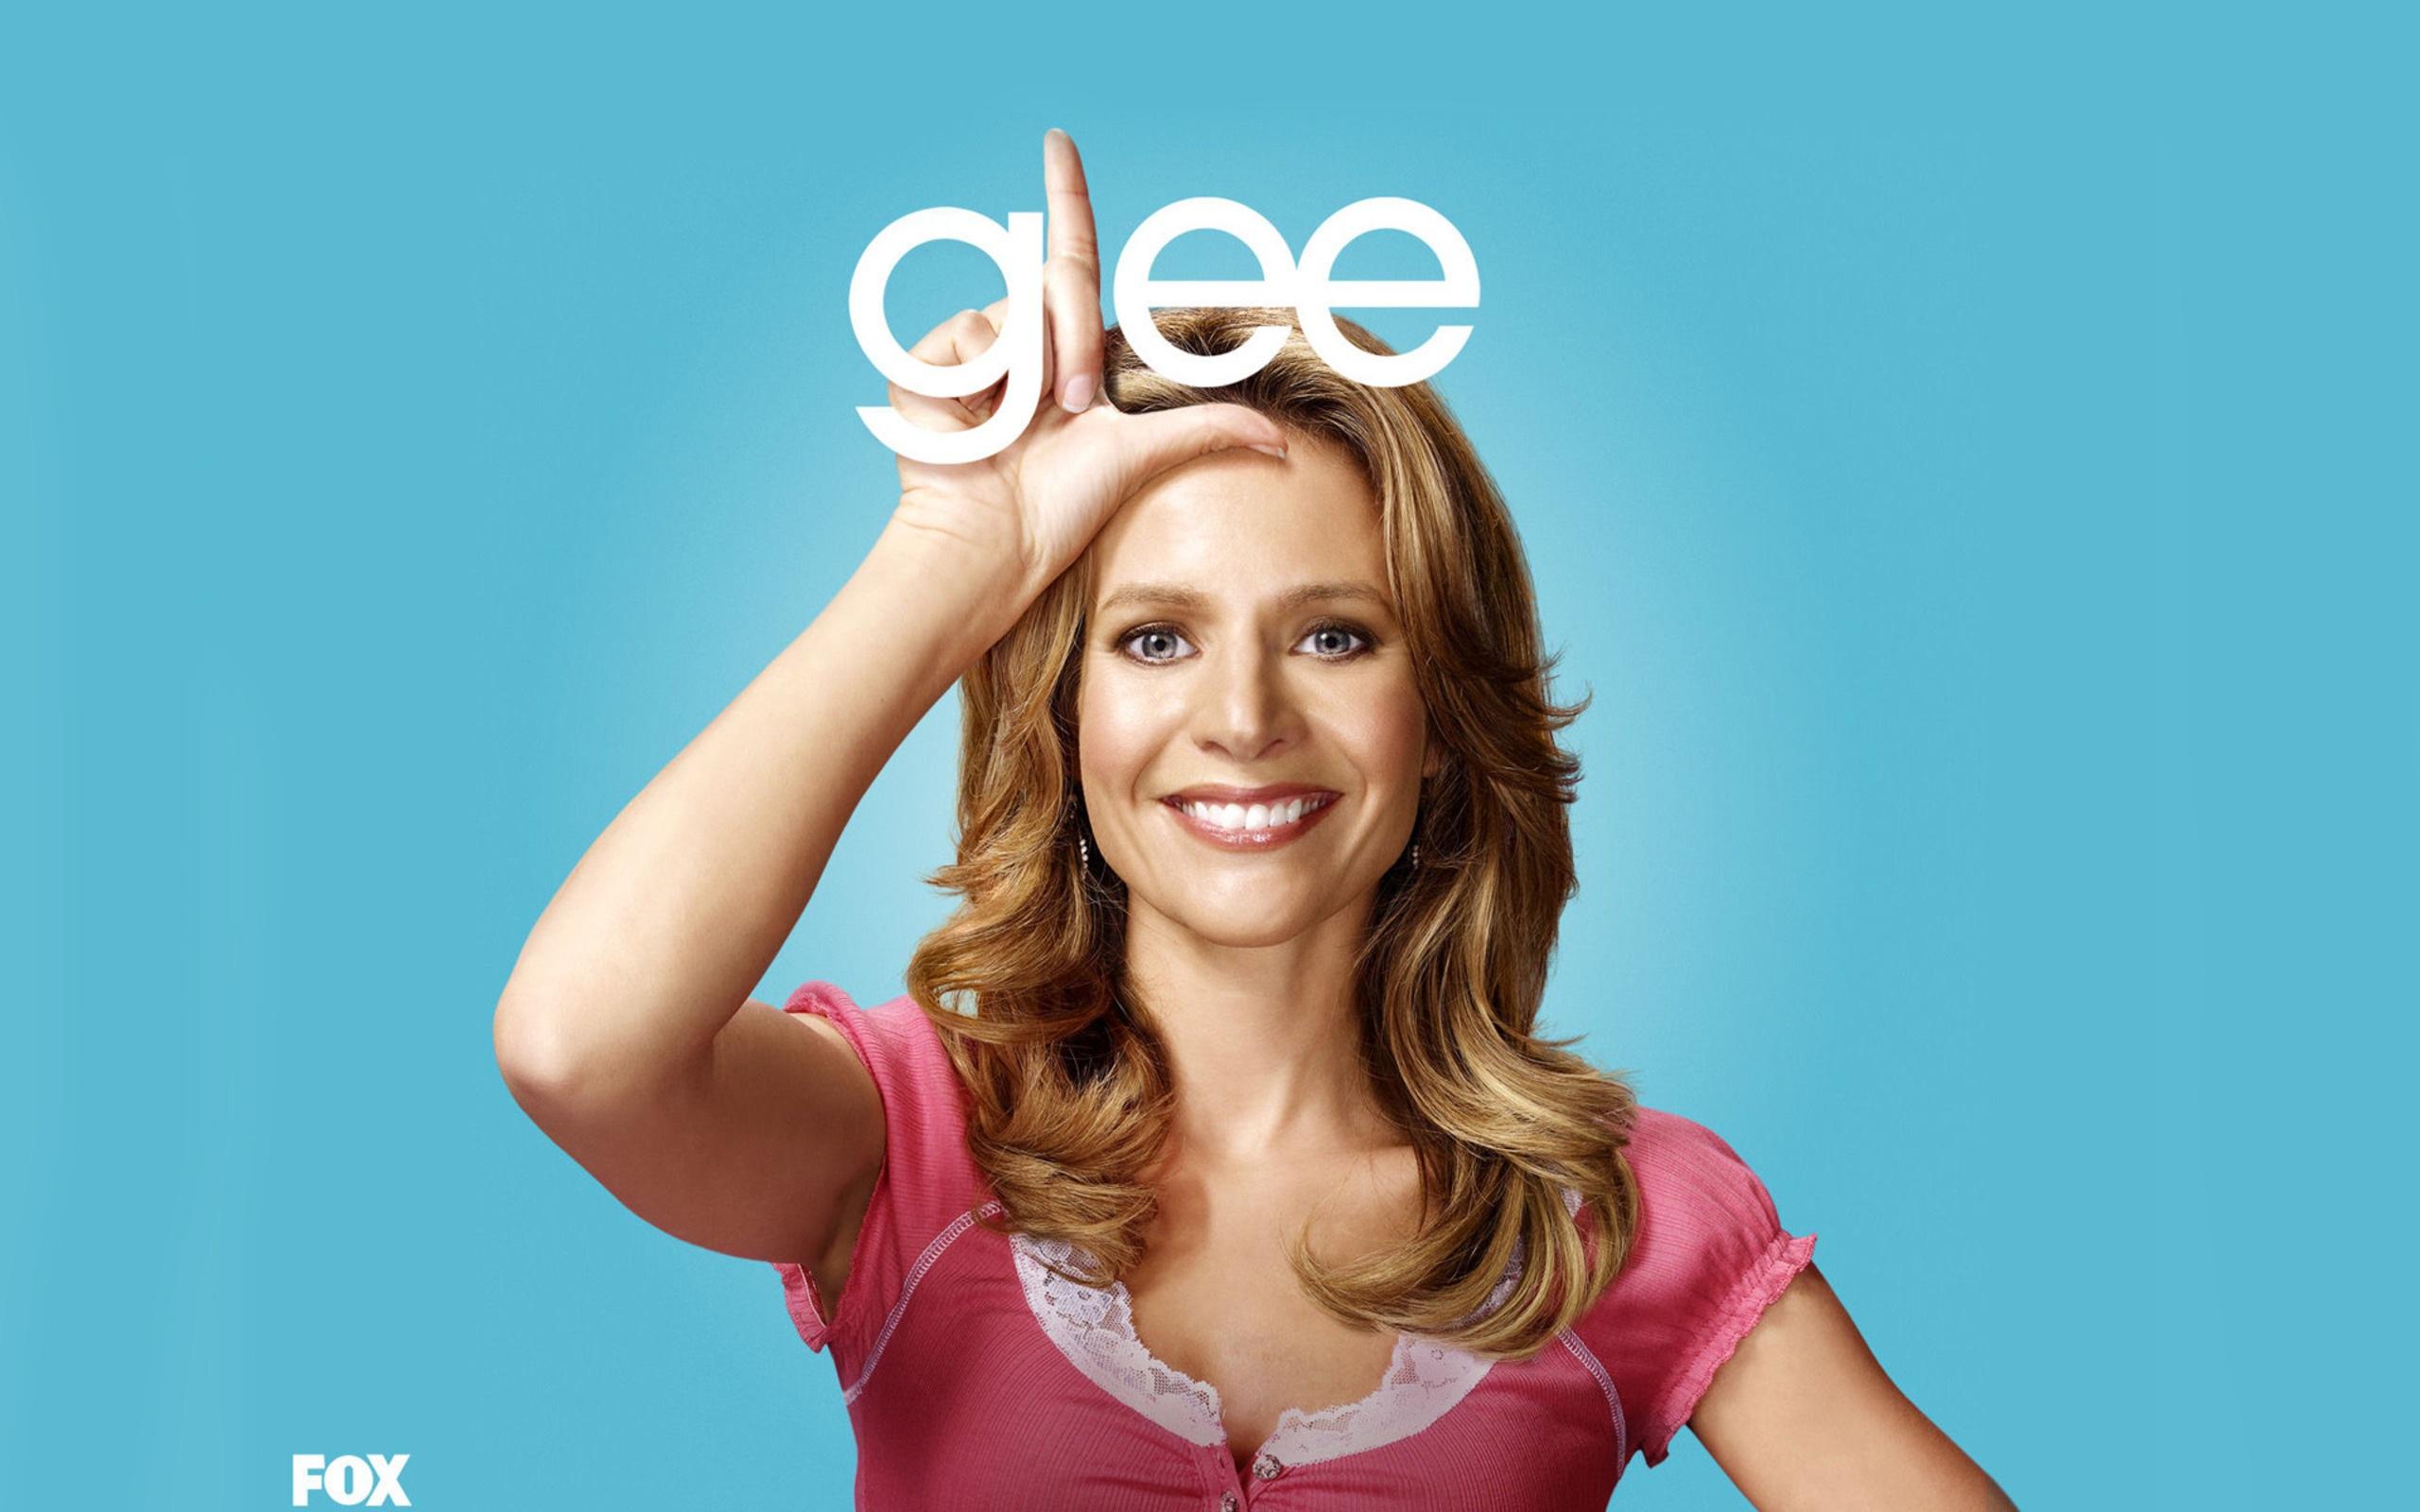 Glee Wallpaper 18